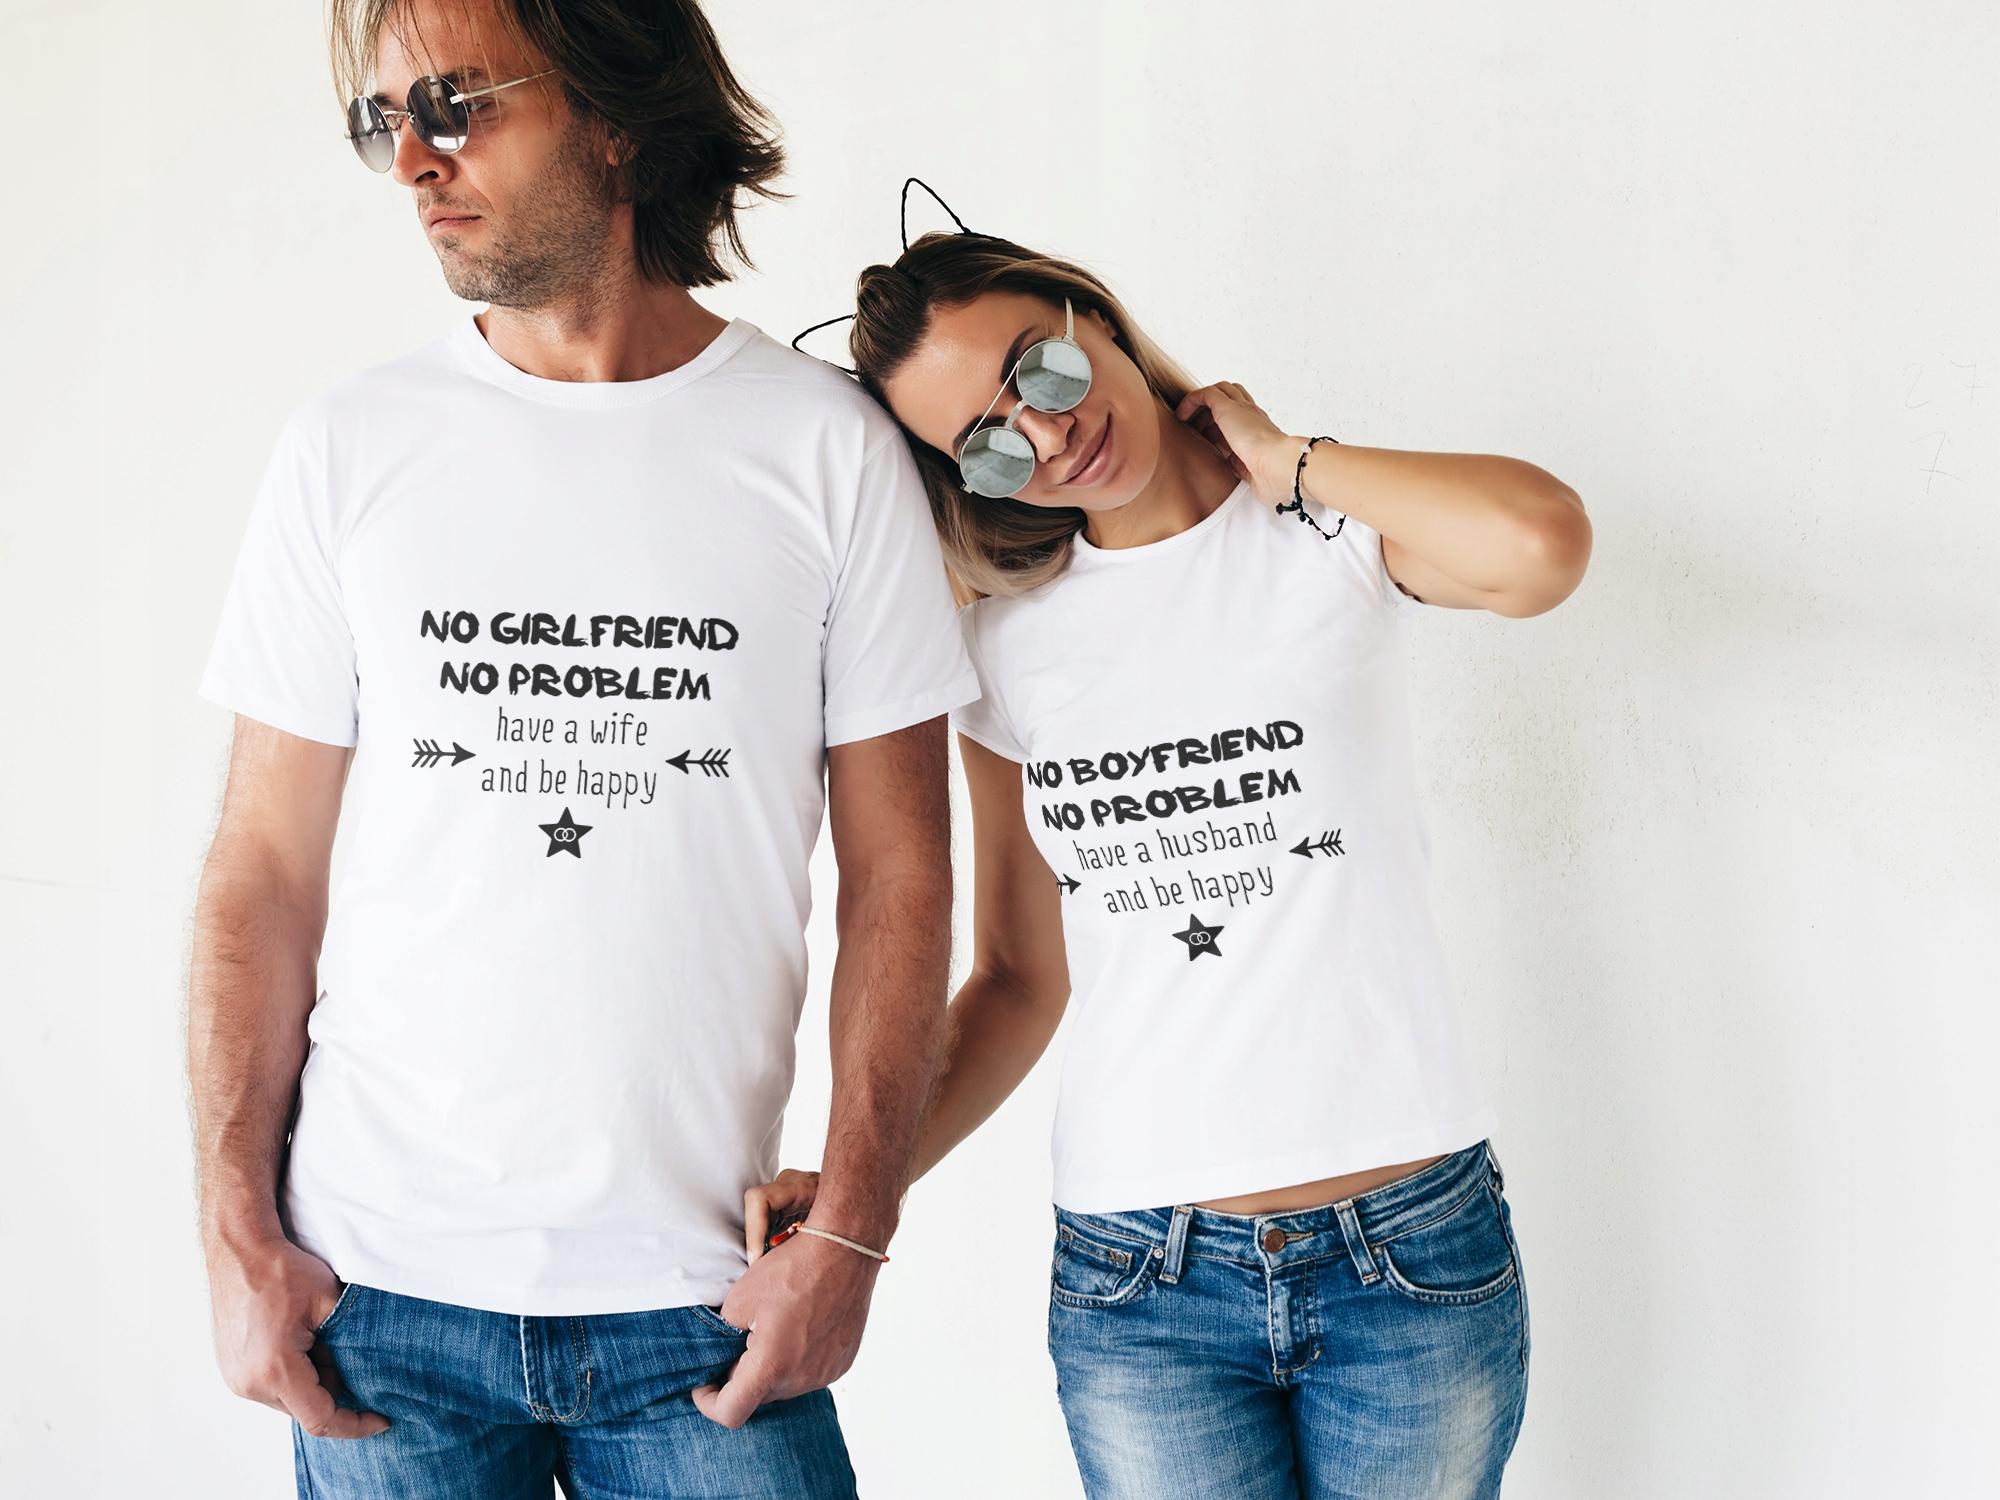 Koszulki Dla Par No Girl Boyfriend No Problem 7571249170 Allegro Pl